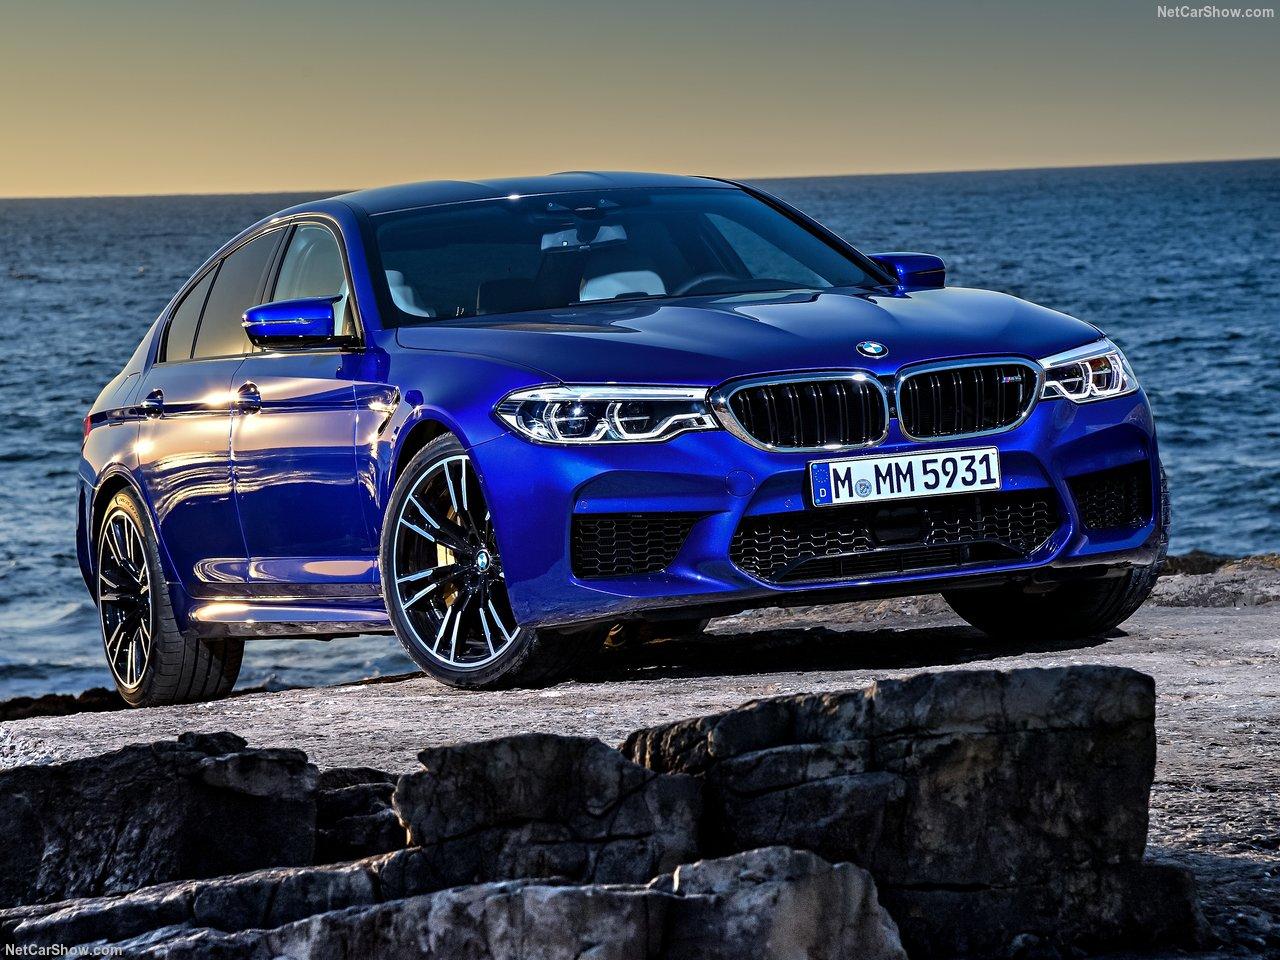 BMW F90 M5 8시간 논스톱 드리프트 기네스 신기록 수립!!